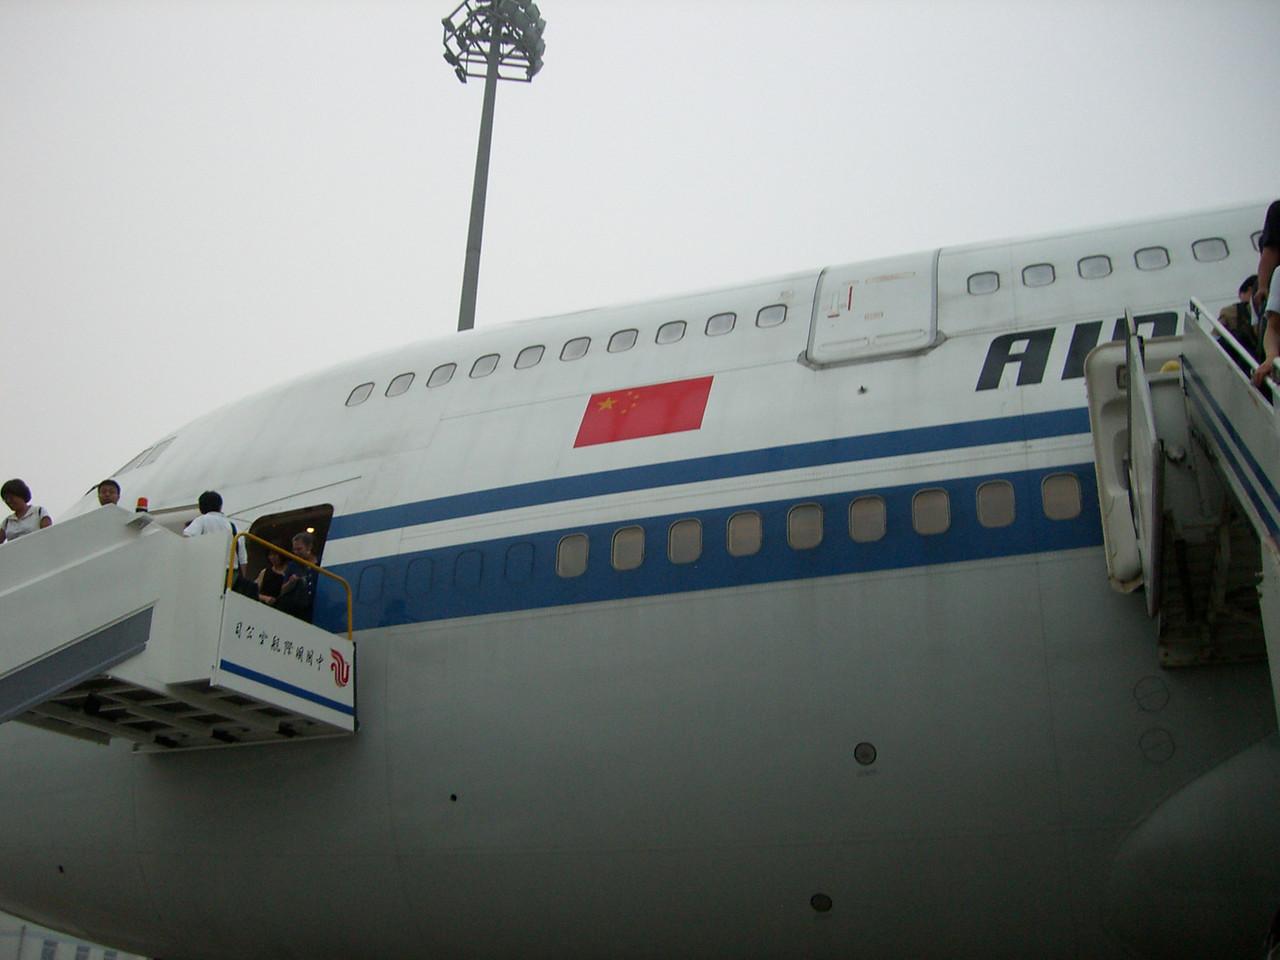 2006 07 13 Thu - Air China side